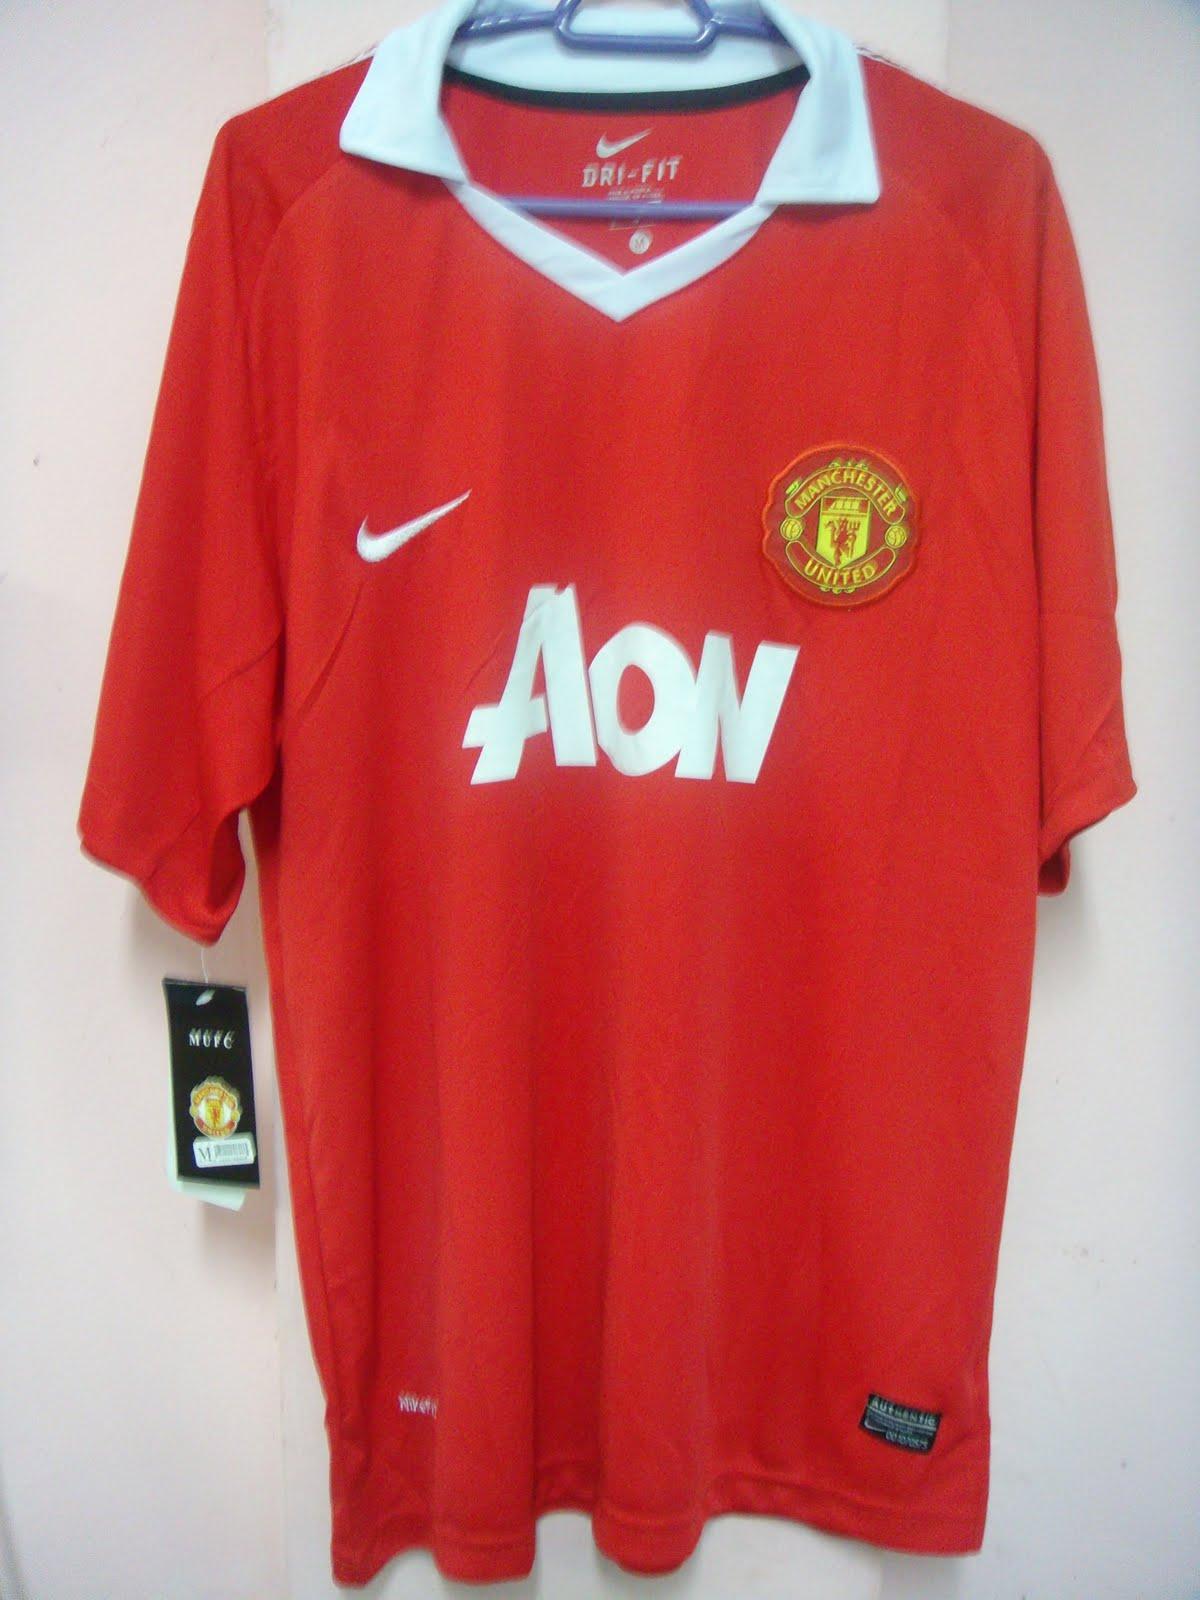 sneakers for cheap 497e3 4827d Eman E-Jersey Blogshop: Manchester United New Kit 2010/2011 ...